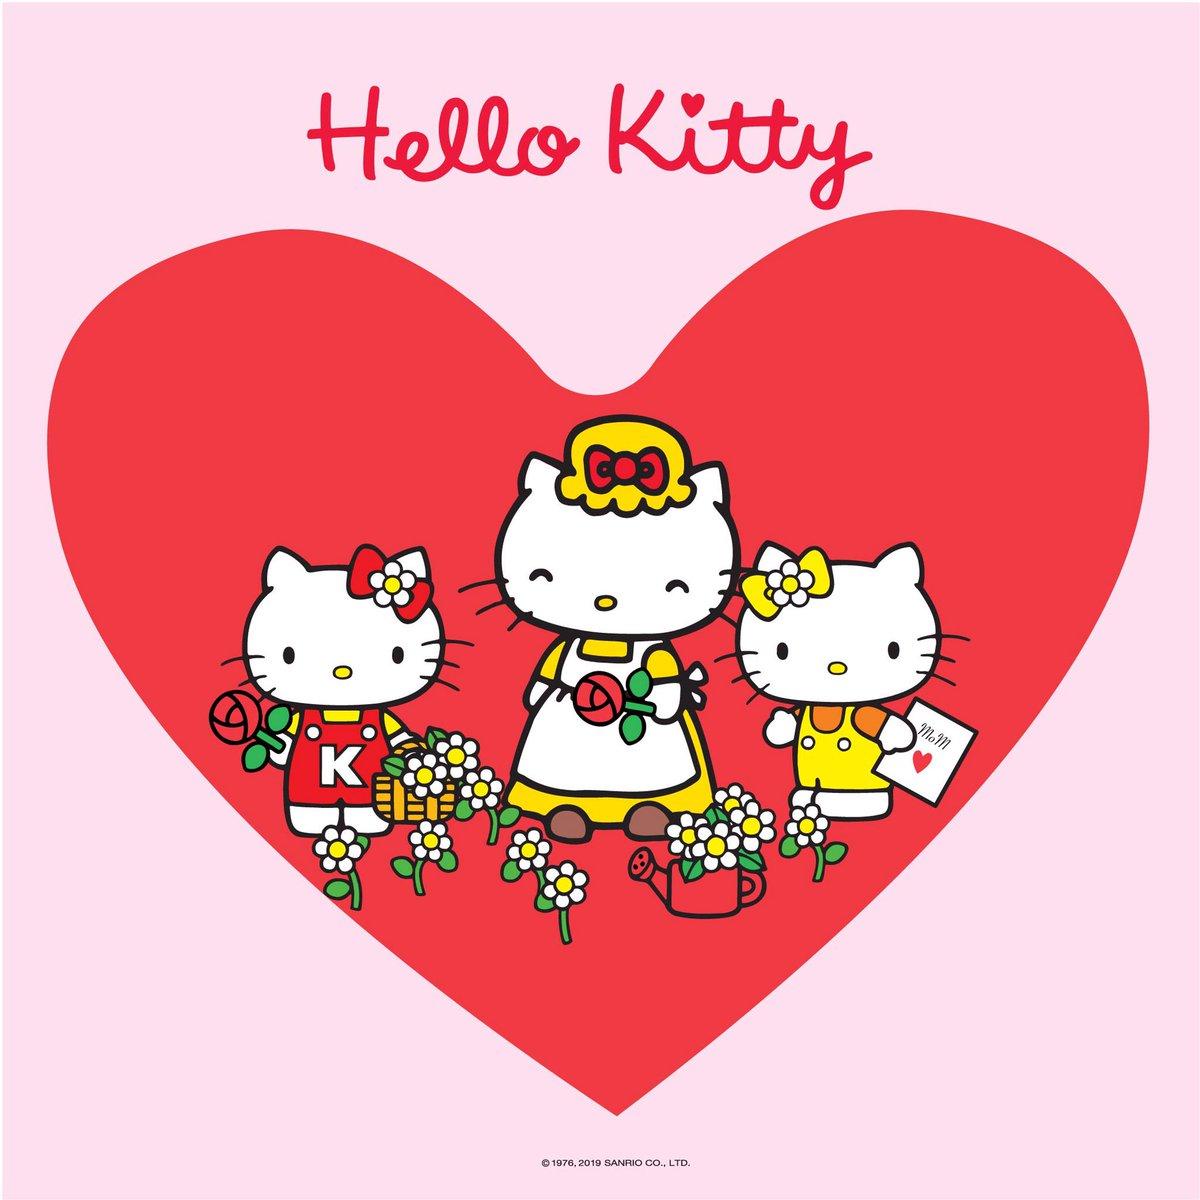 ff0e9a8c6 Hello Kitty Europe (@WeRHelloKitty) | Twitter